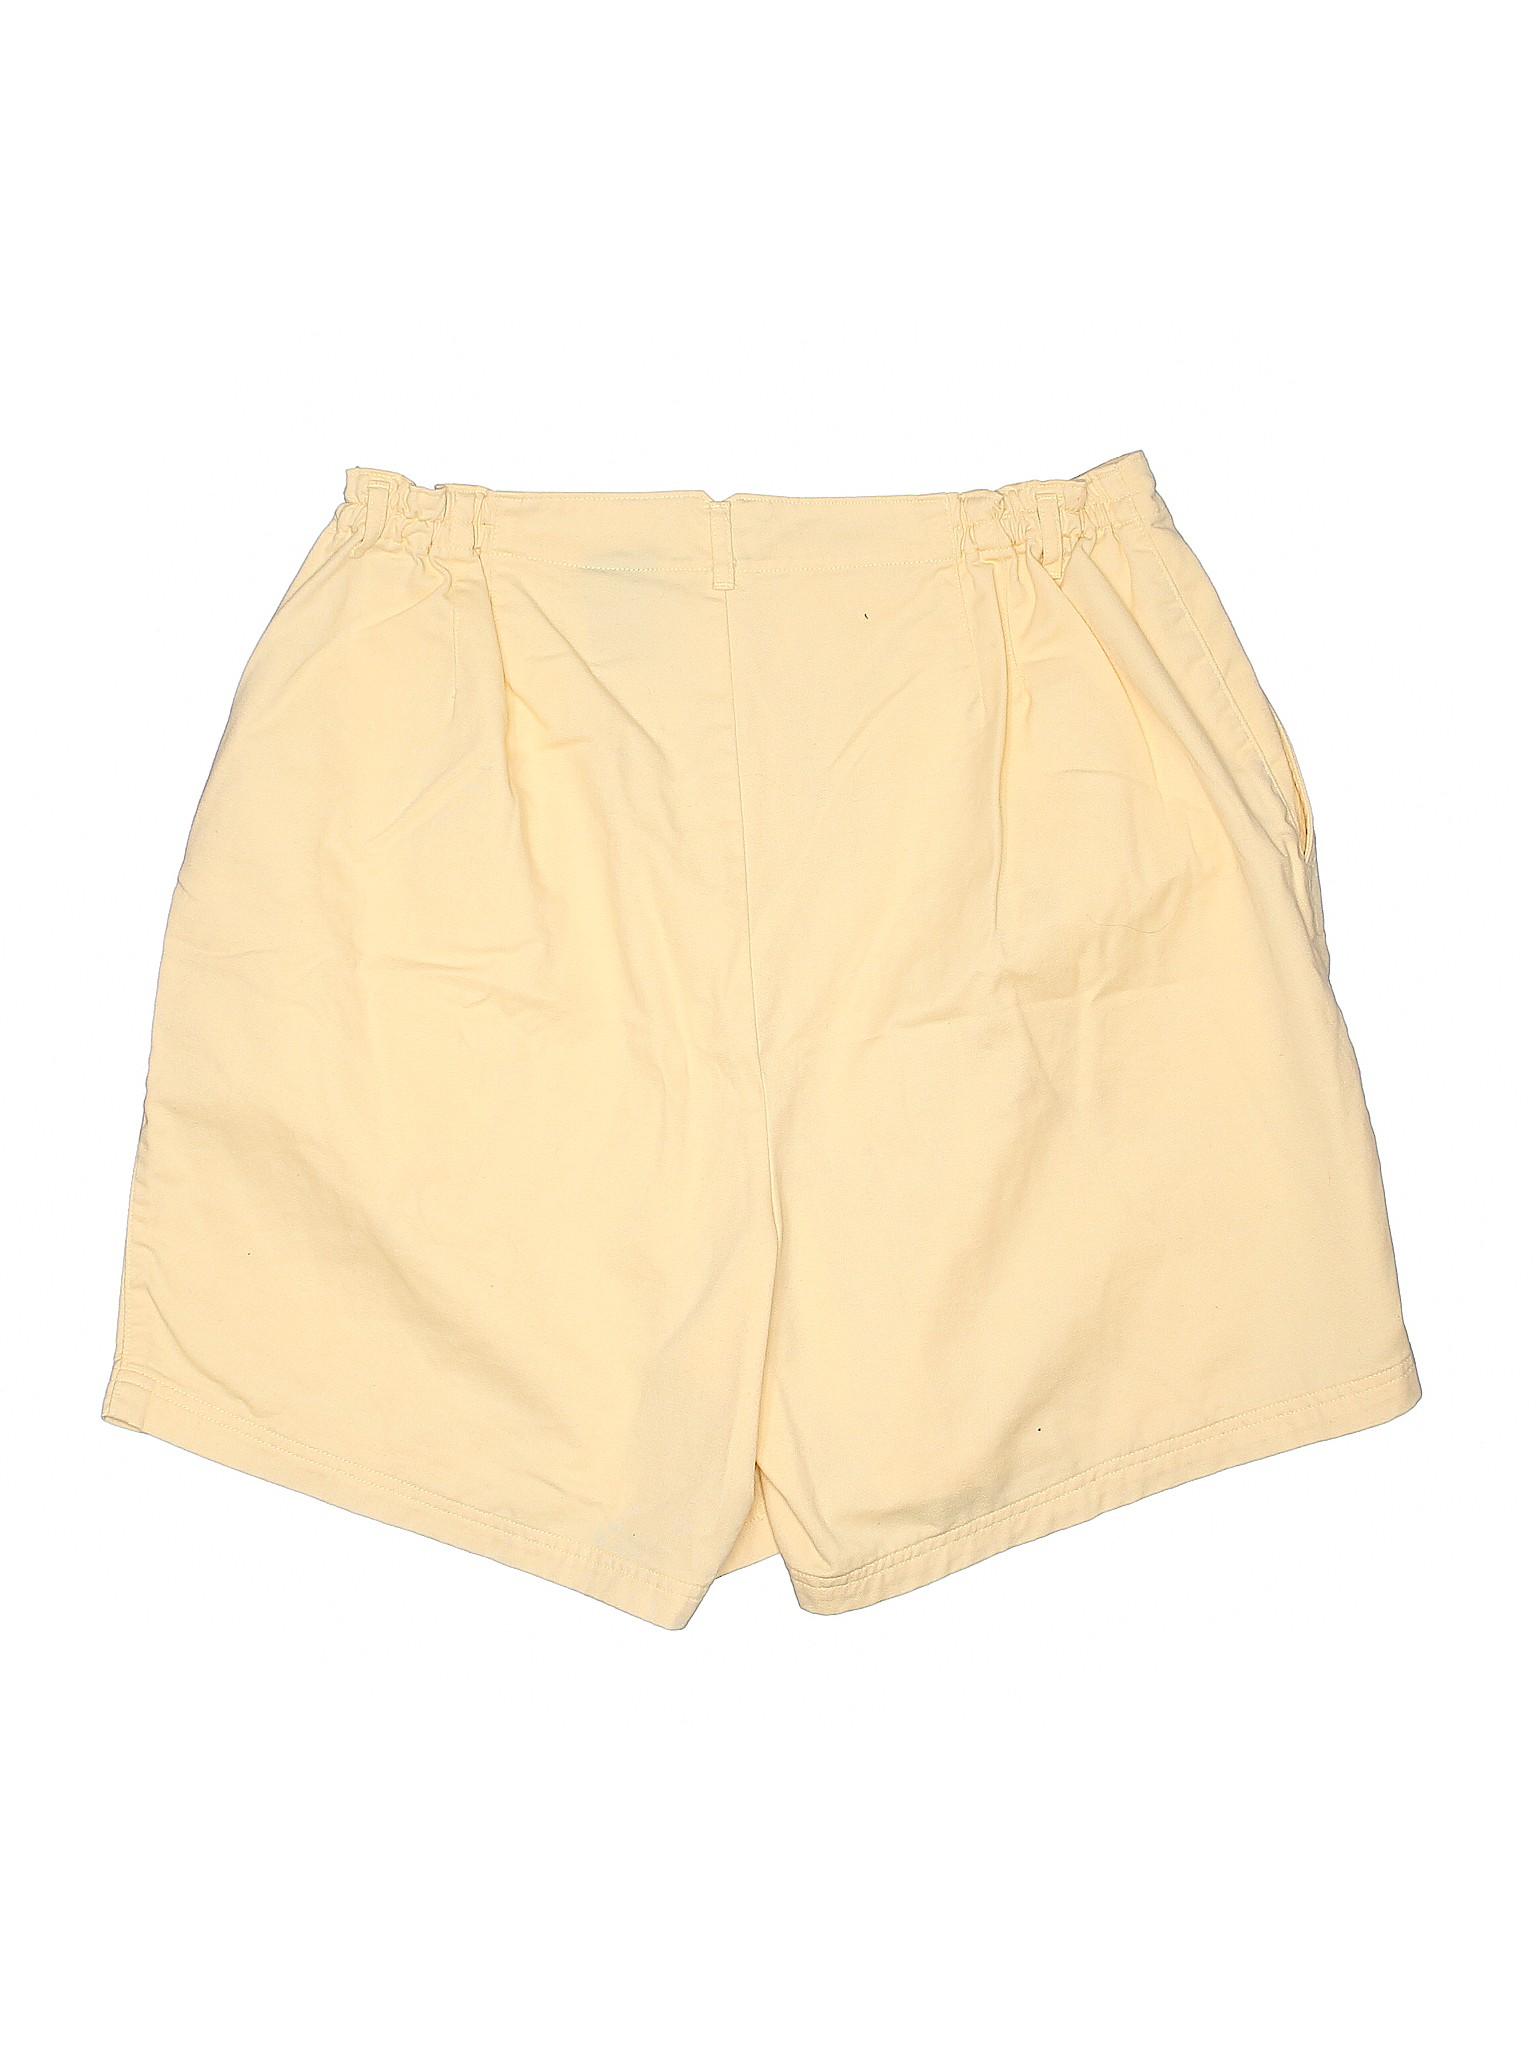 Club Boutique Boutique Shorts Hunt Hunt Khaki Shorts Khaki Club WZgPBqF